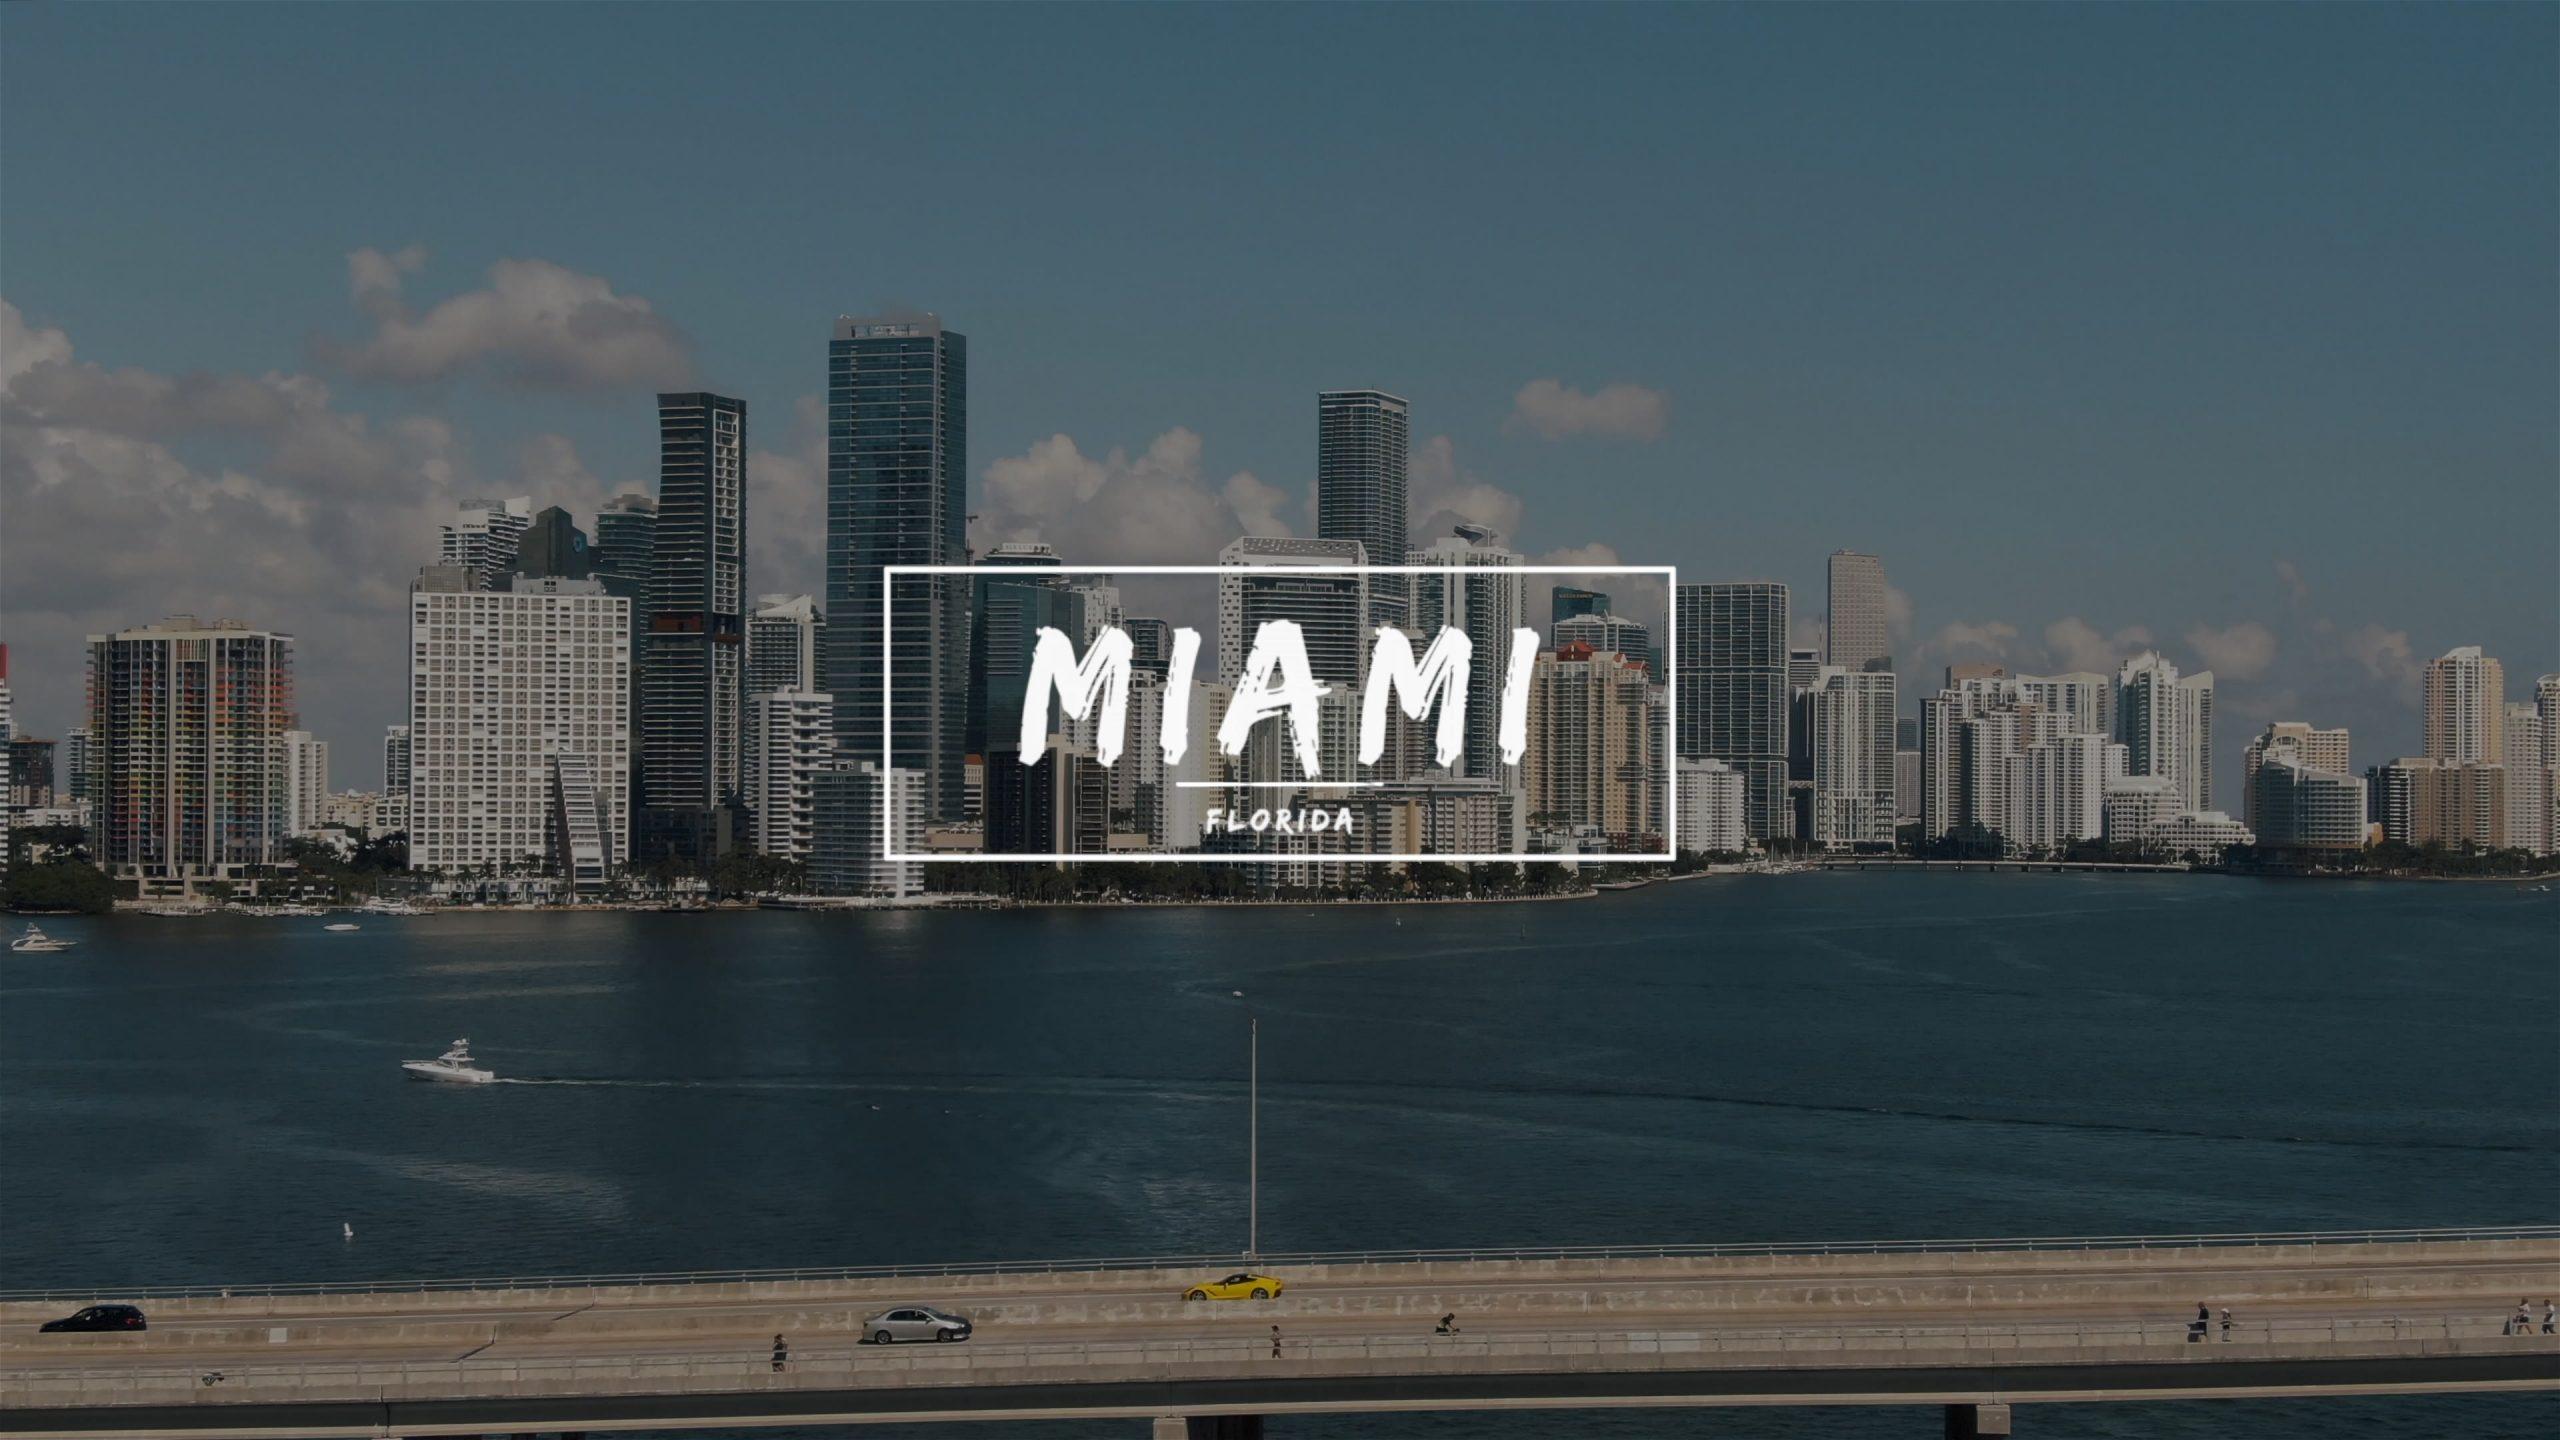 Brickell Waterfront Aerials Downtown Miami